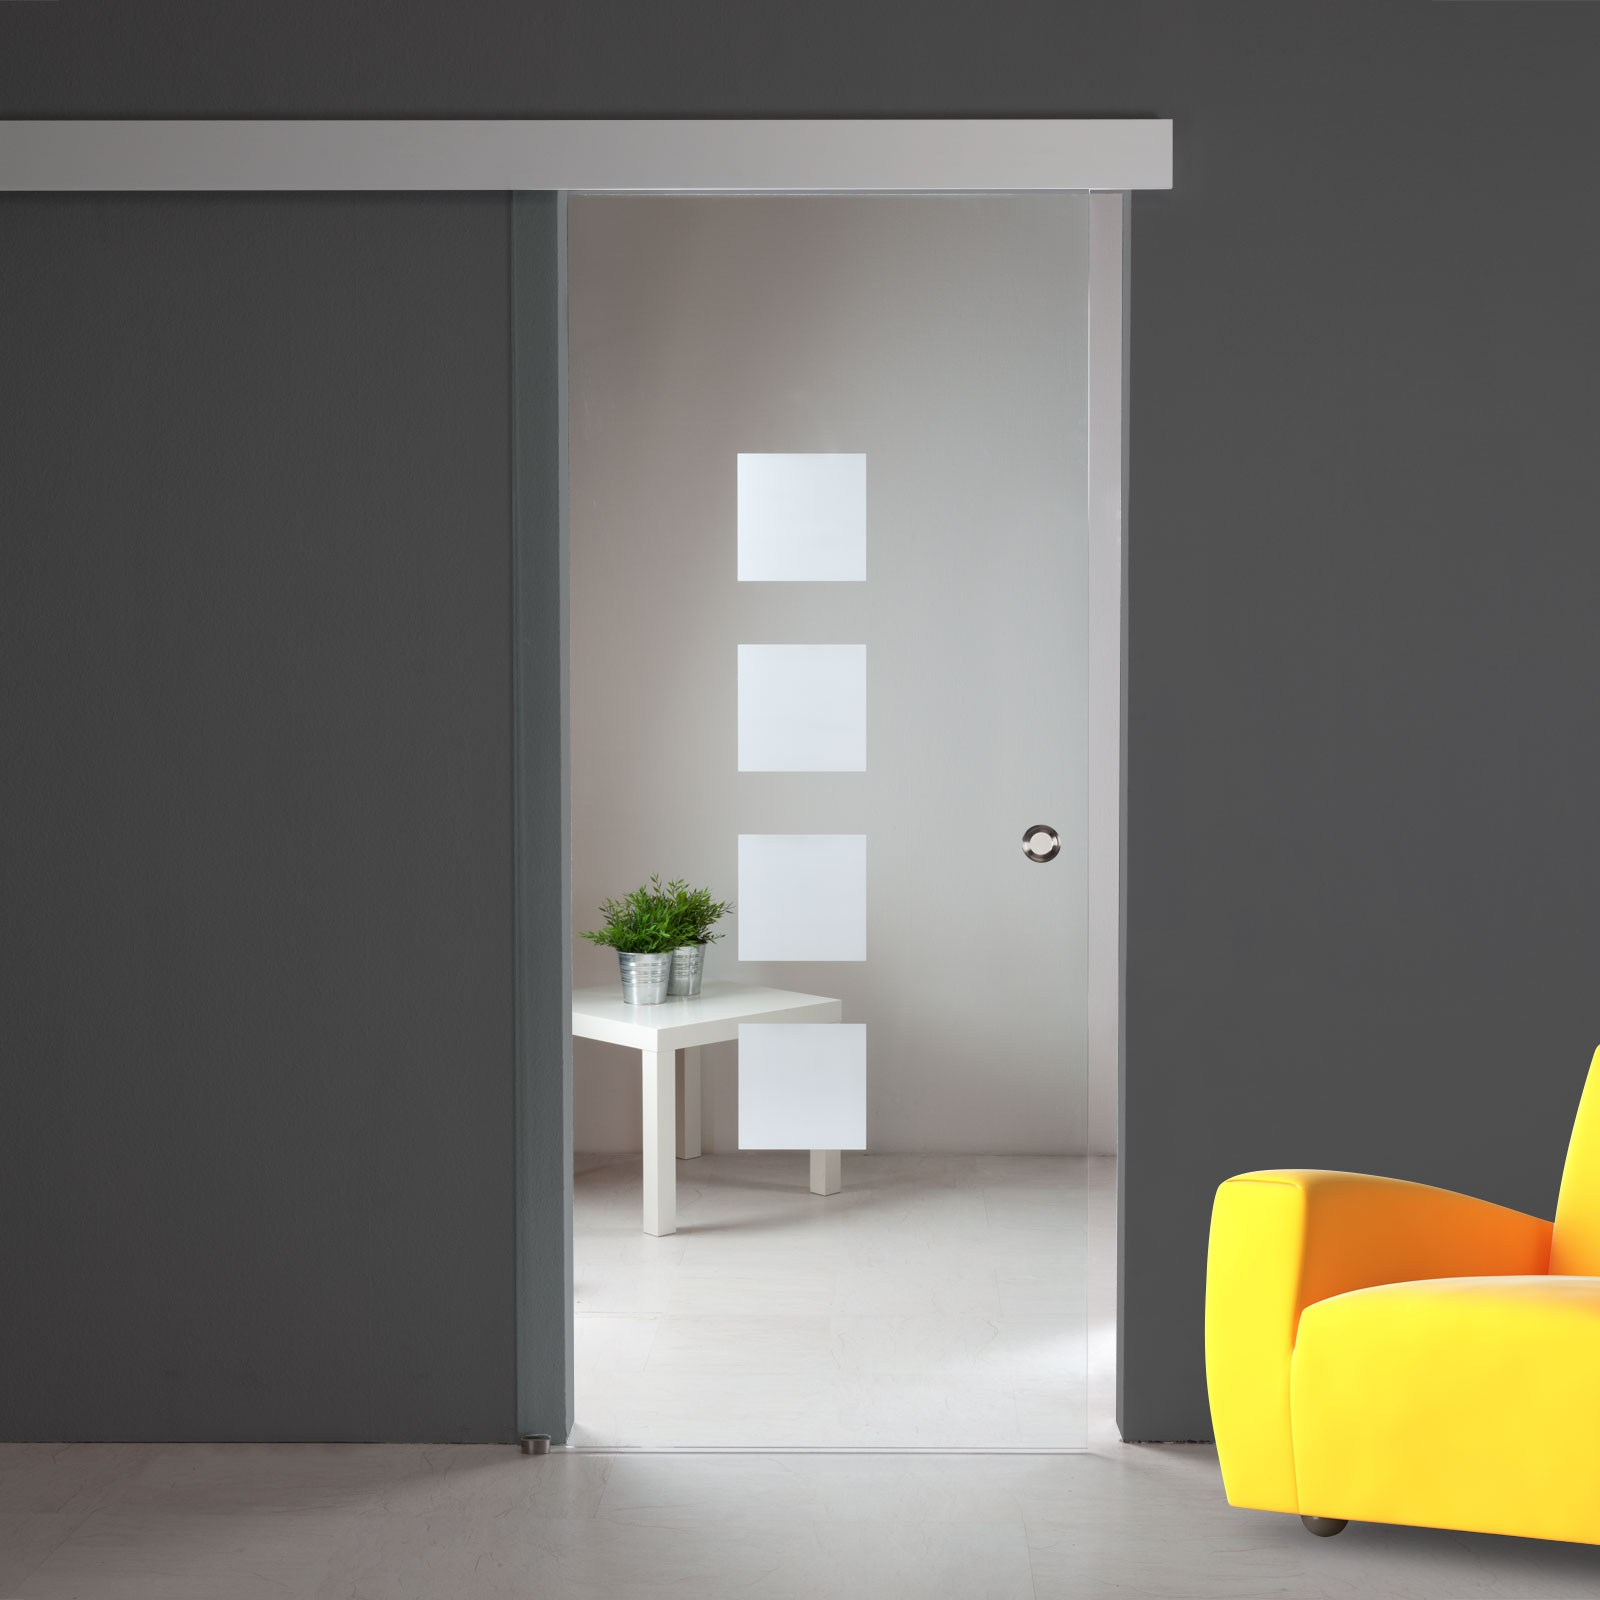 glasschiebet r sd721 f alu60 klarglas dekor griffmuschel edelstahl ebay. Black Bedroom Furniture Sets. Home Design Ideas